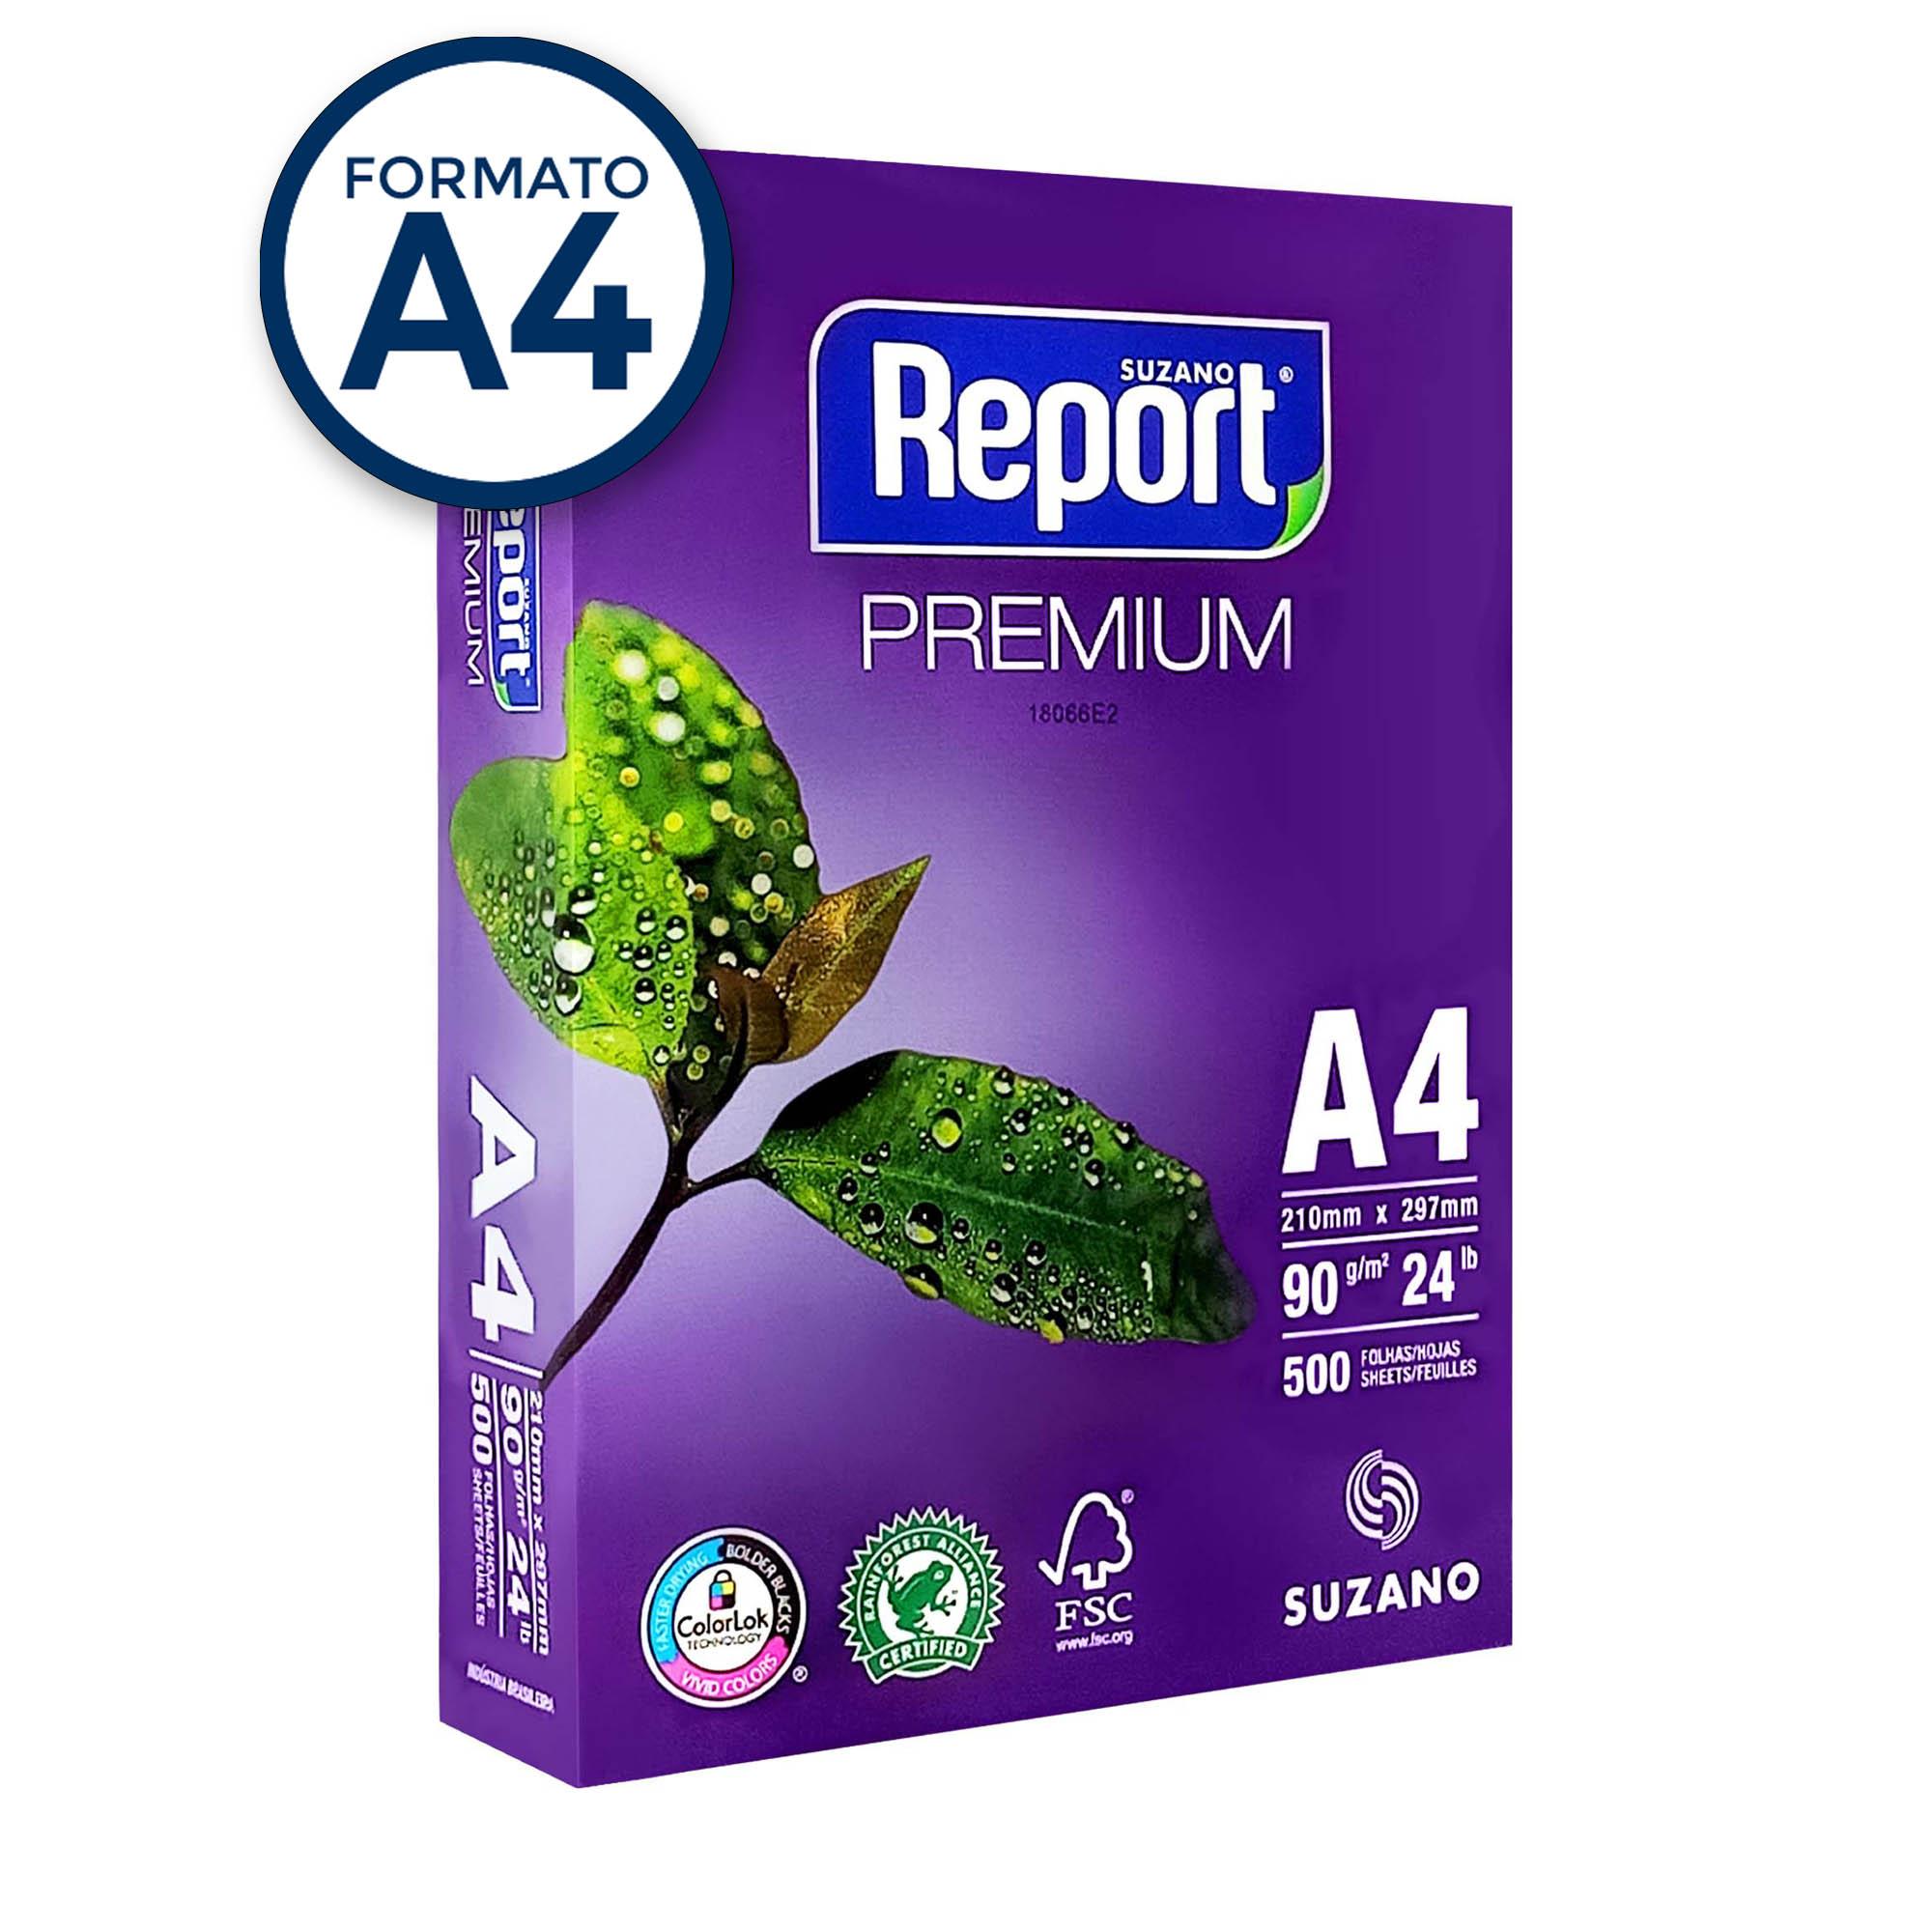 Papel Sulfite A4 90g Report Premium PT 500 fls - Suzano